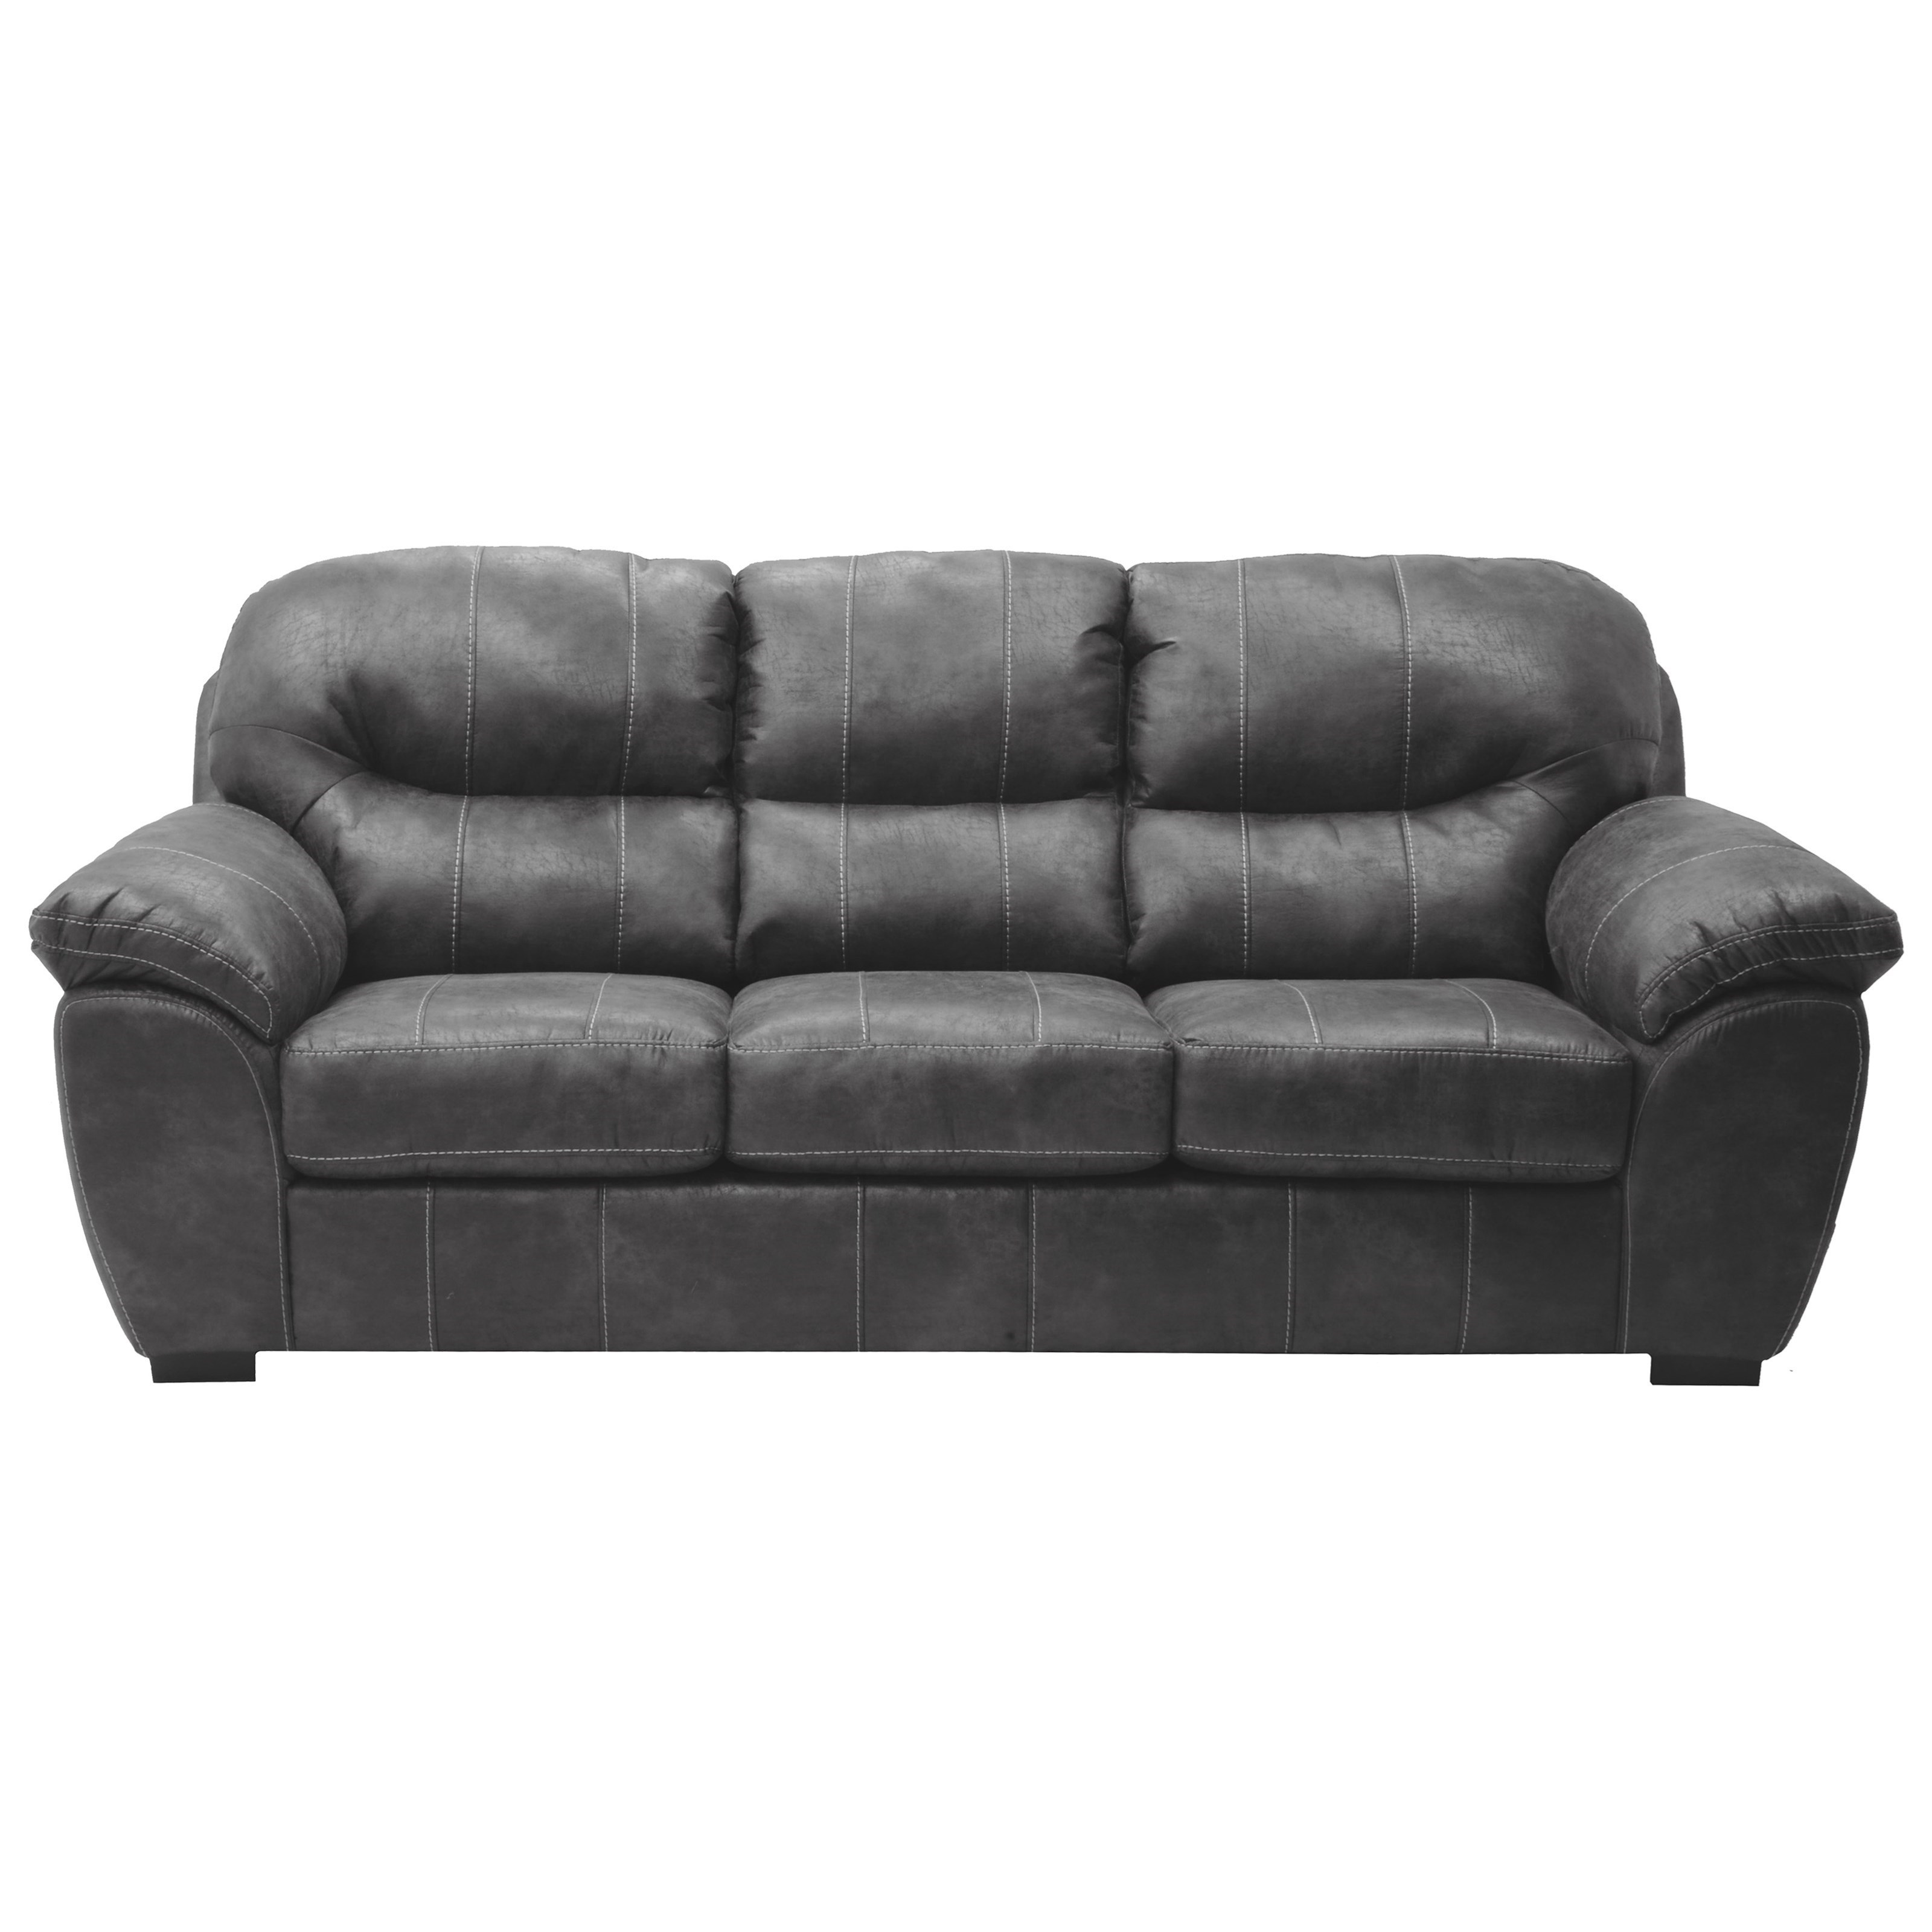 Grant Sleeper Sofa by Jackson Furniture at Fine Home Furnishings